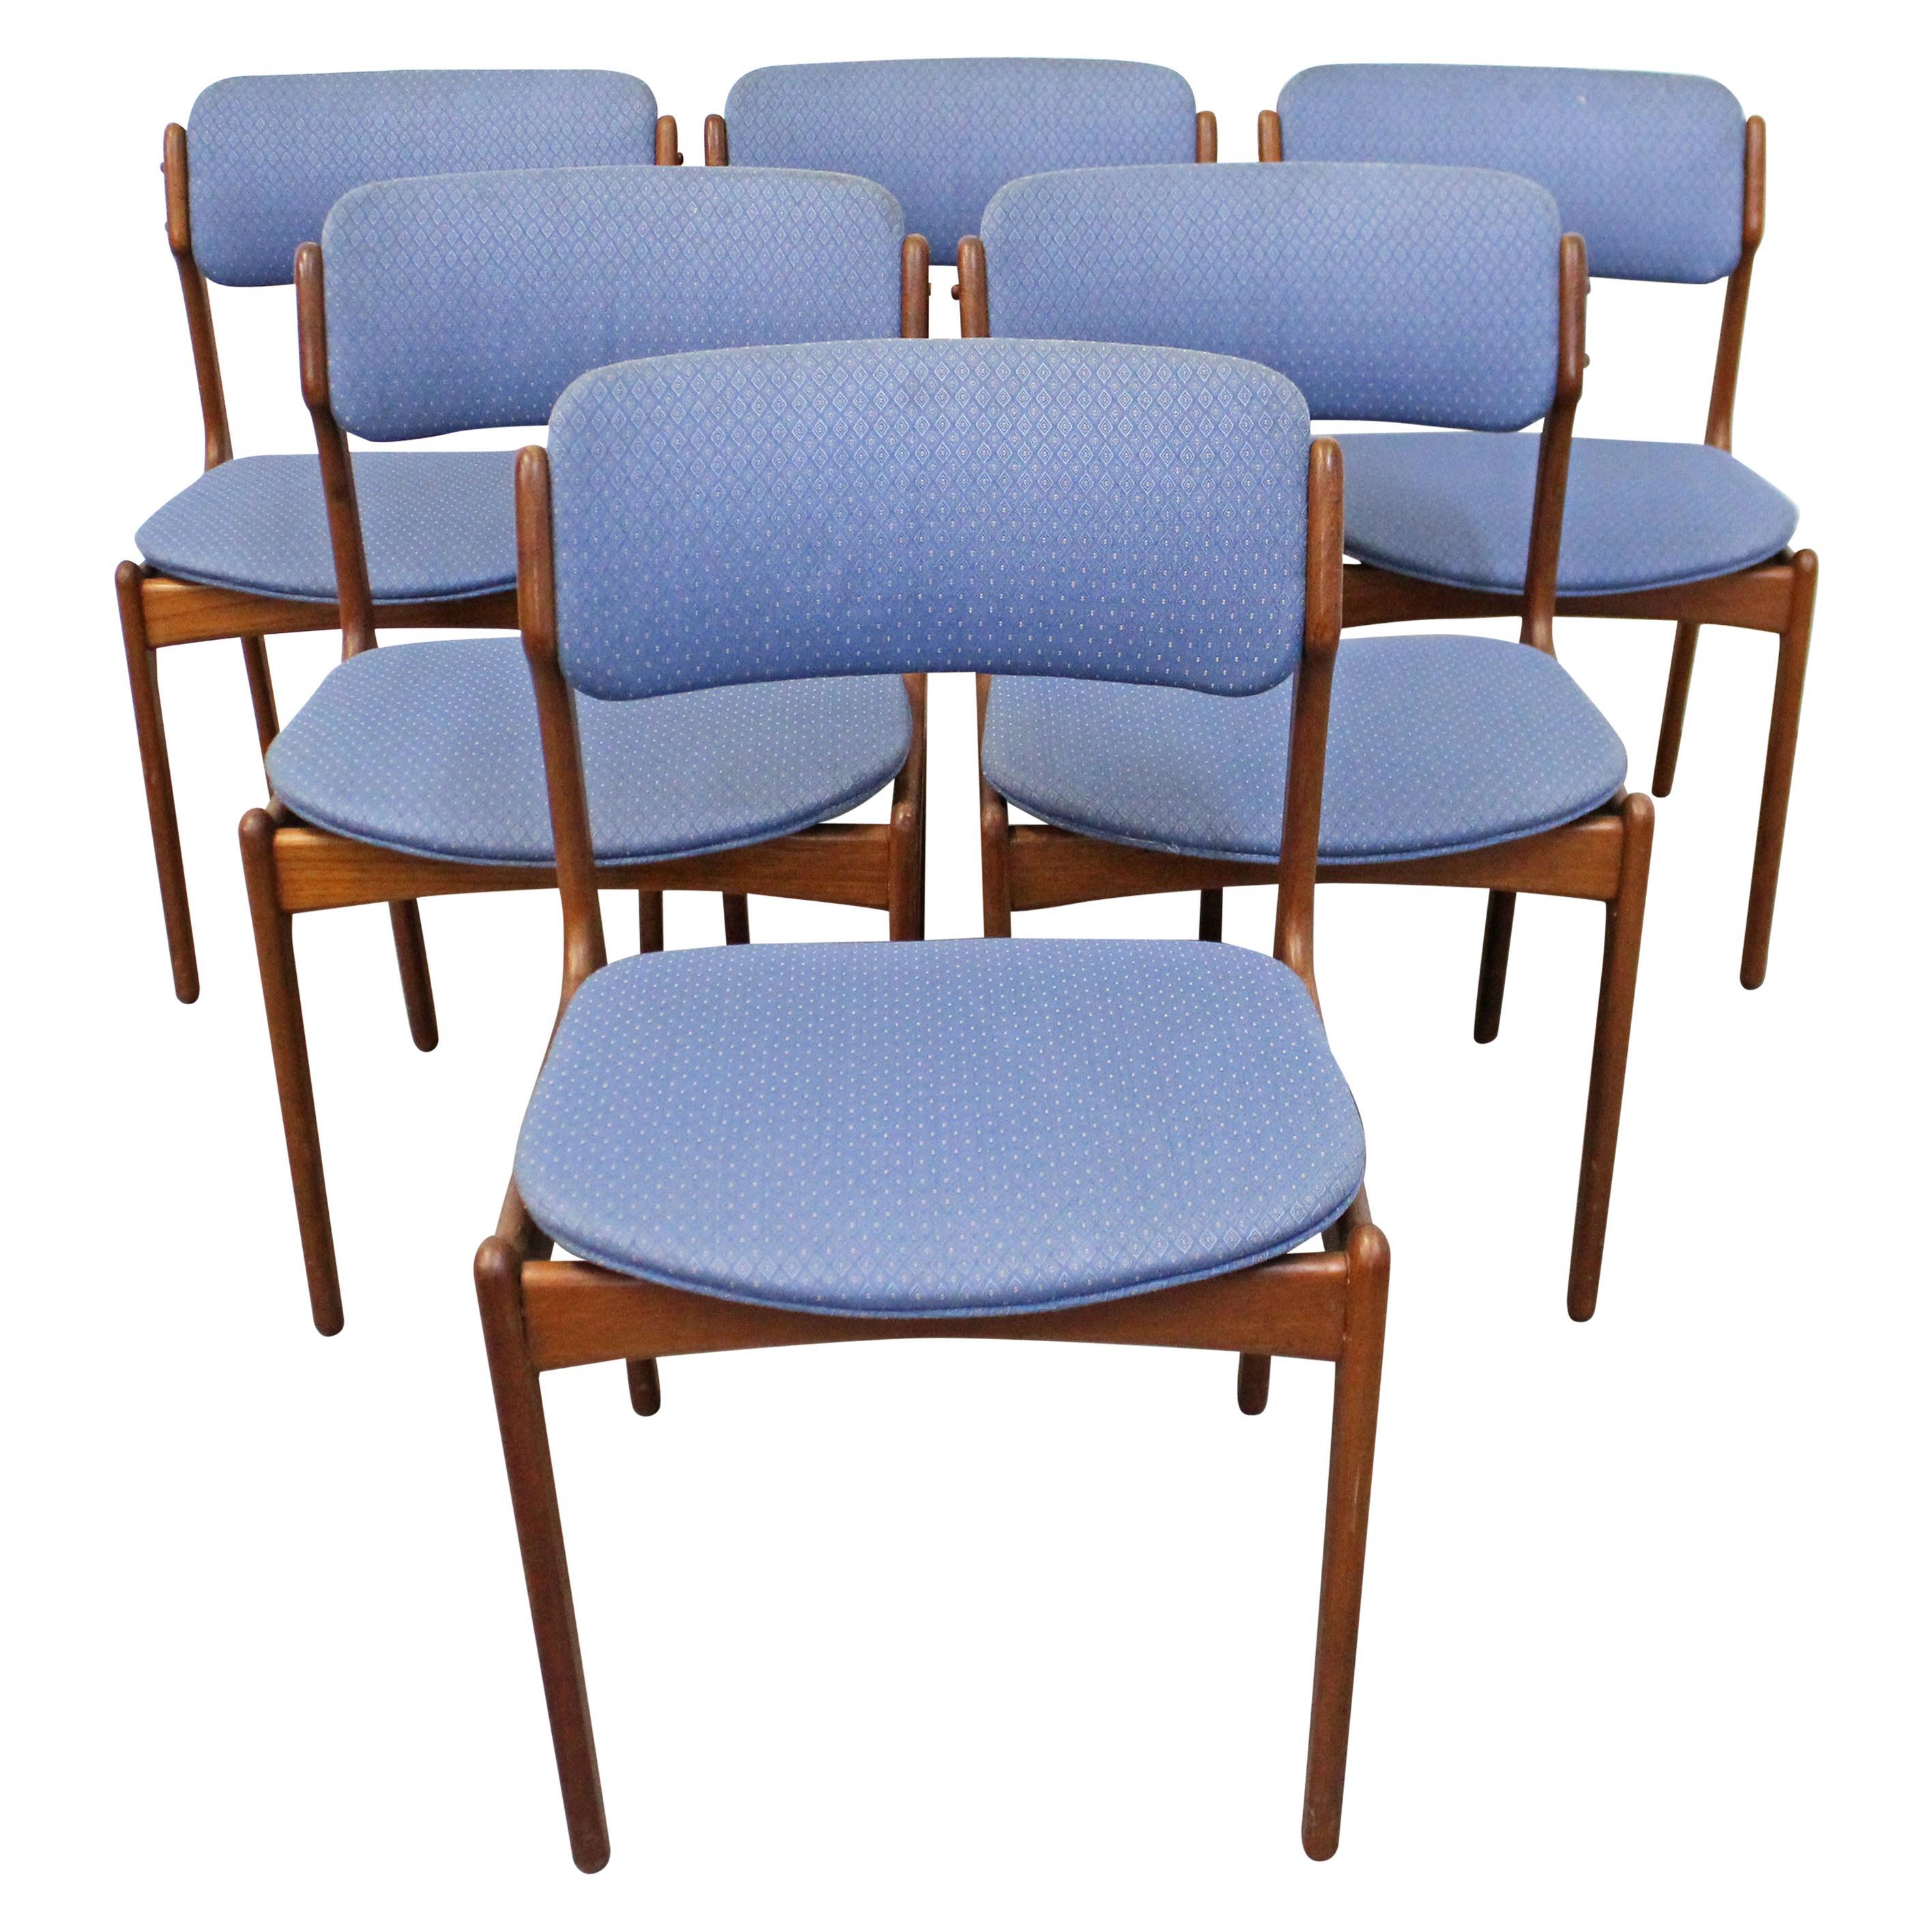 Set of 6 Danish Modern Erik Buch for O.D. Mobler Teak Dining Chairs